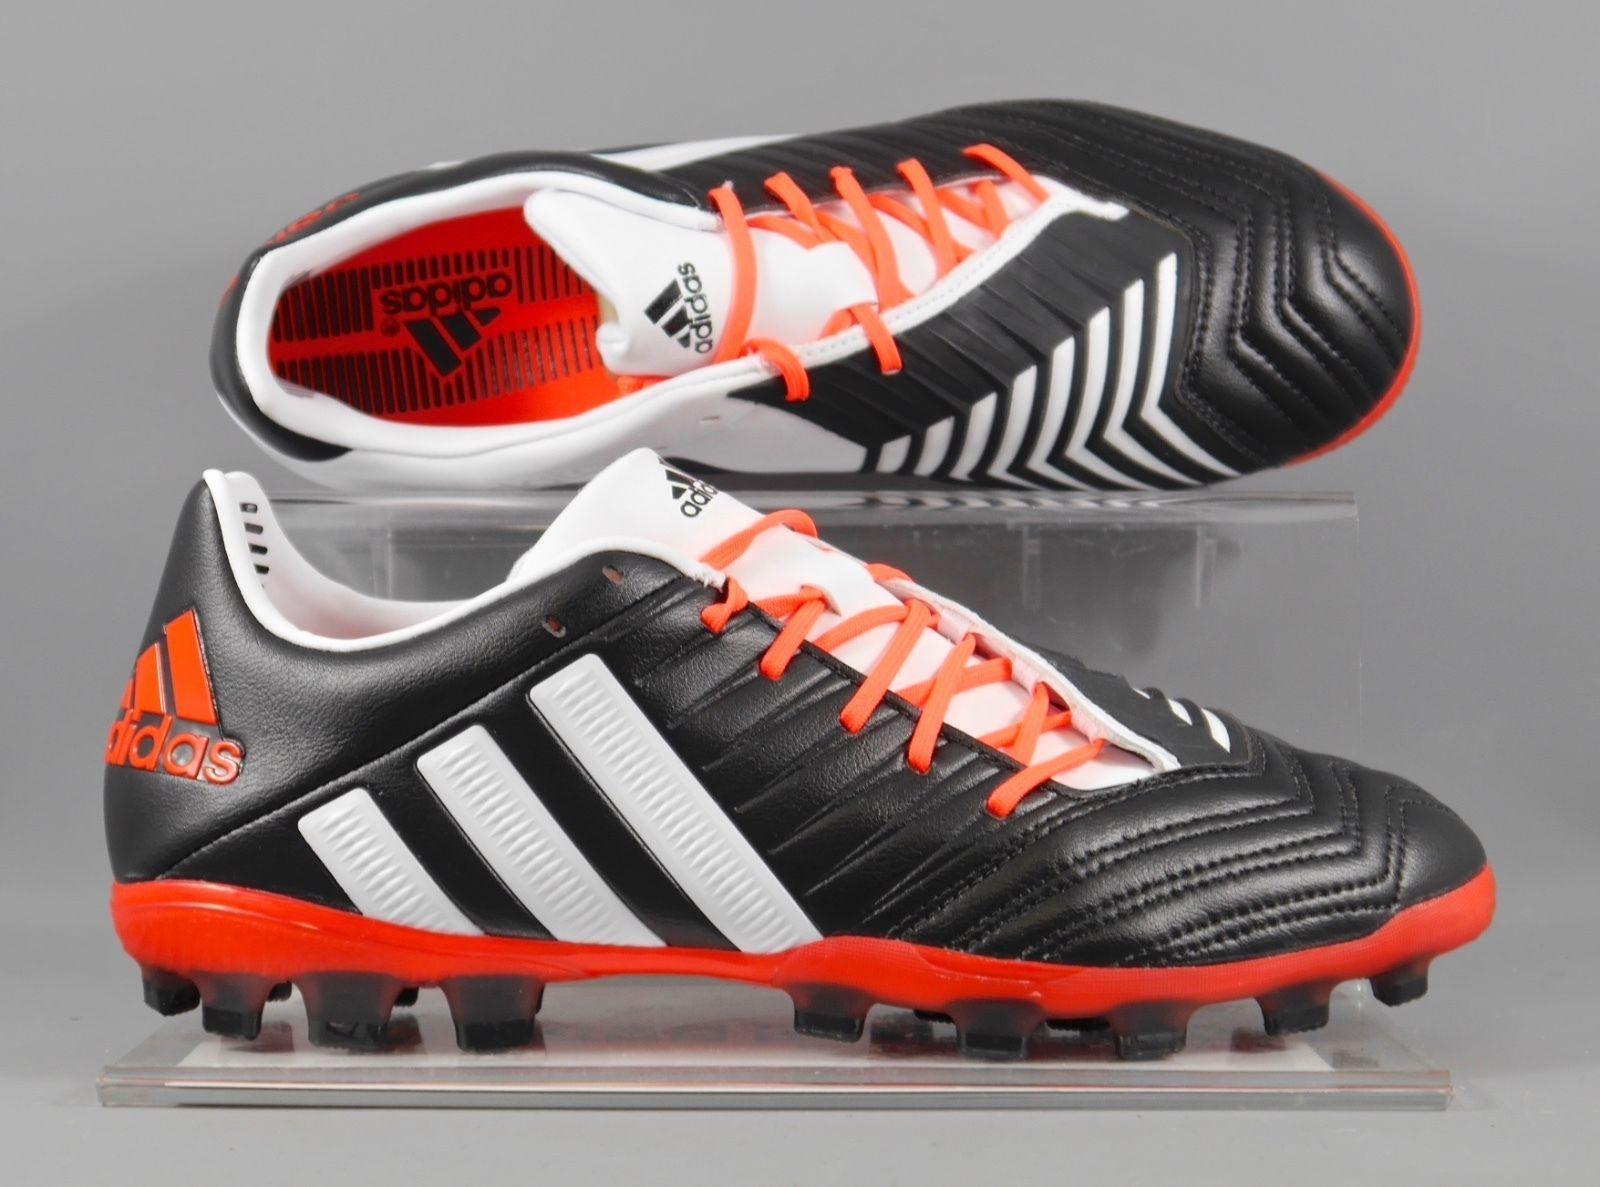 bfd7269532d4 M25661 Adidas Predator Incurza TRX AG